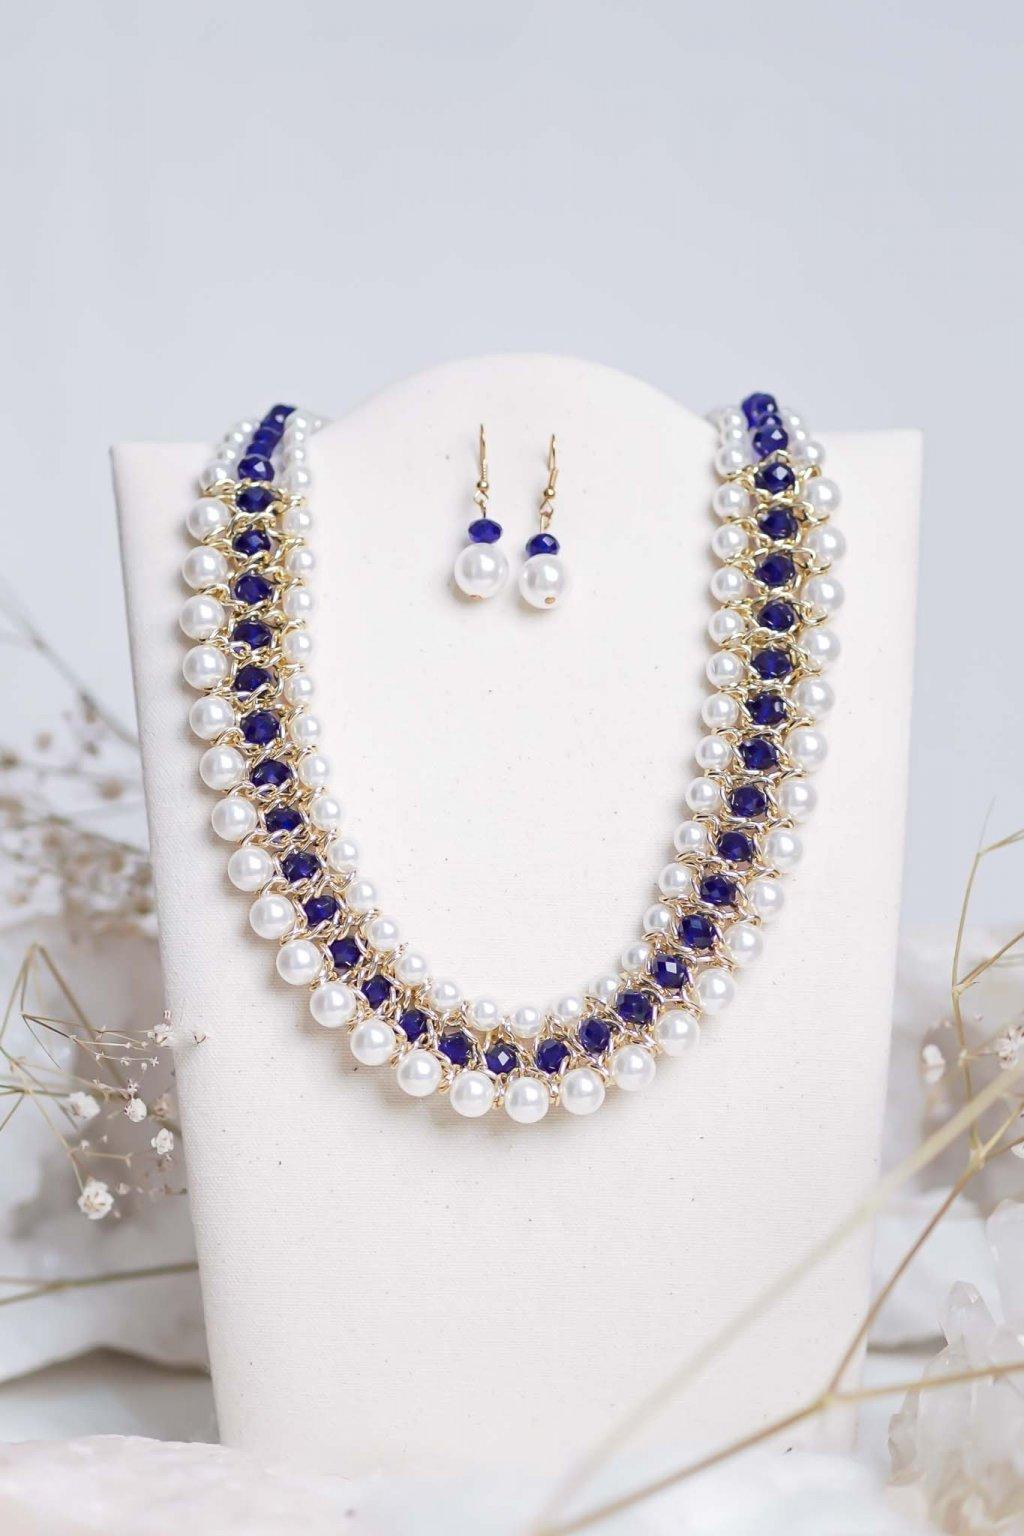 náhrdelník, šperk, spoločenská náhrdelník, náhrdelník na bežný deň, výrazný náhrdelník, jemný náhrdelník, šperky, náhrdelník na ples, svadbu, stužkovú 44